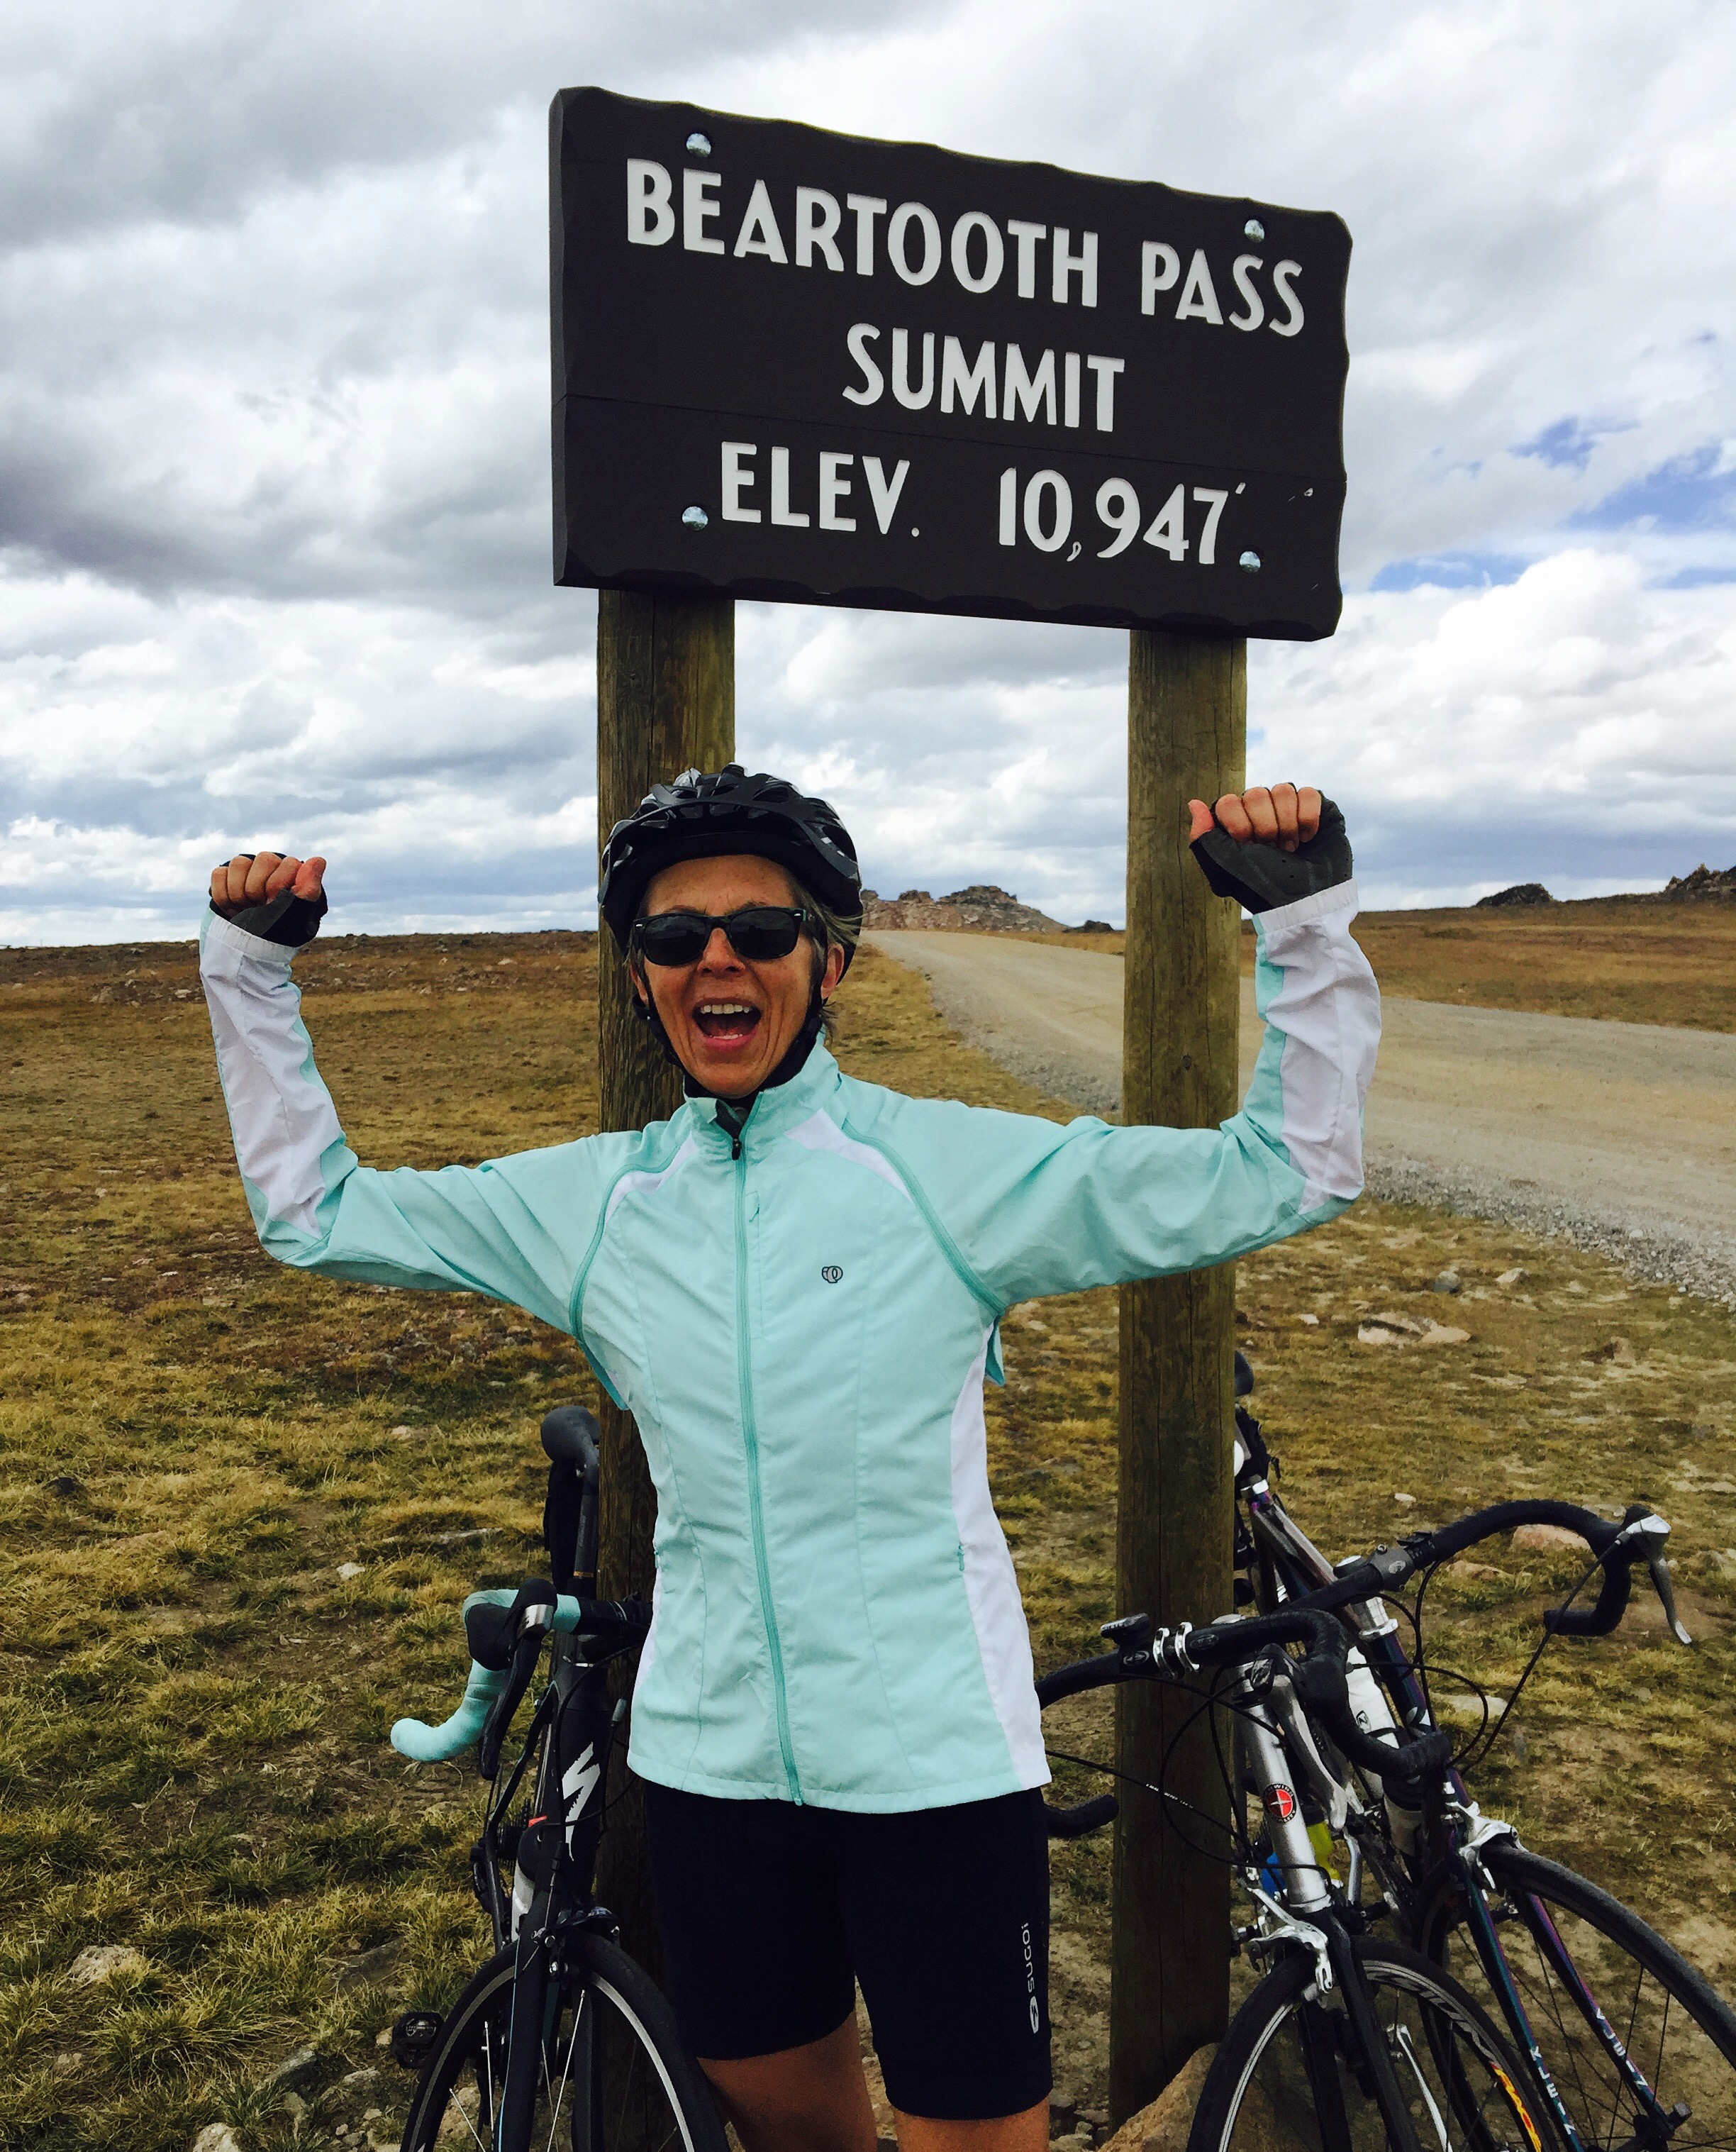 summit beartooth pass.jpg